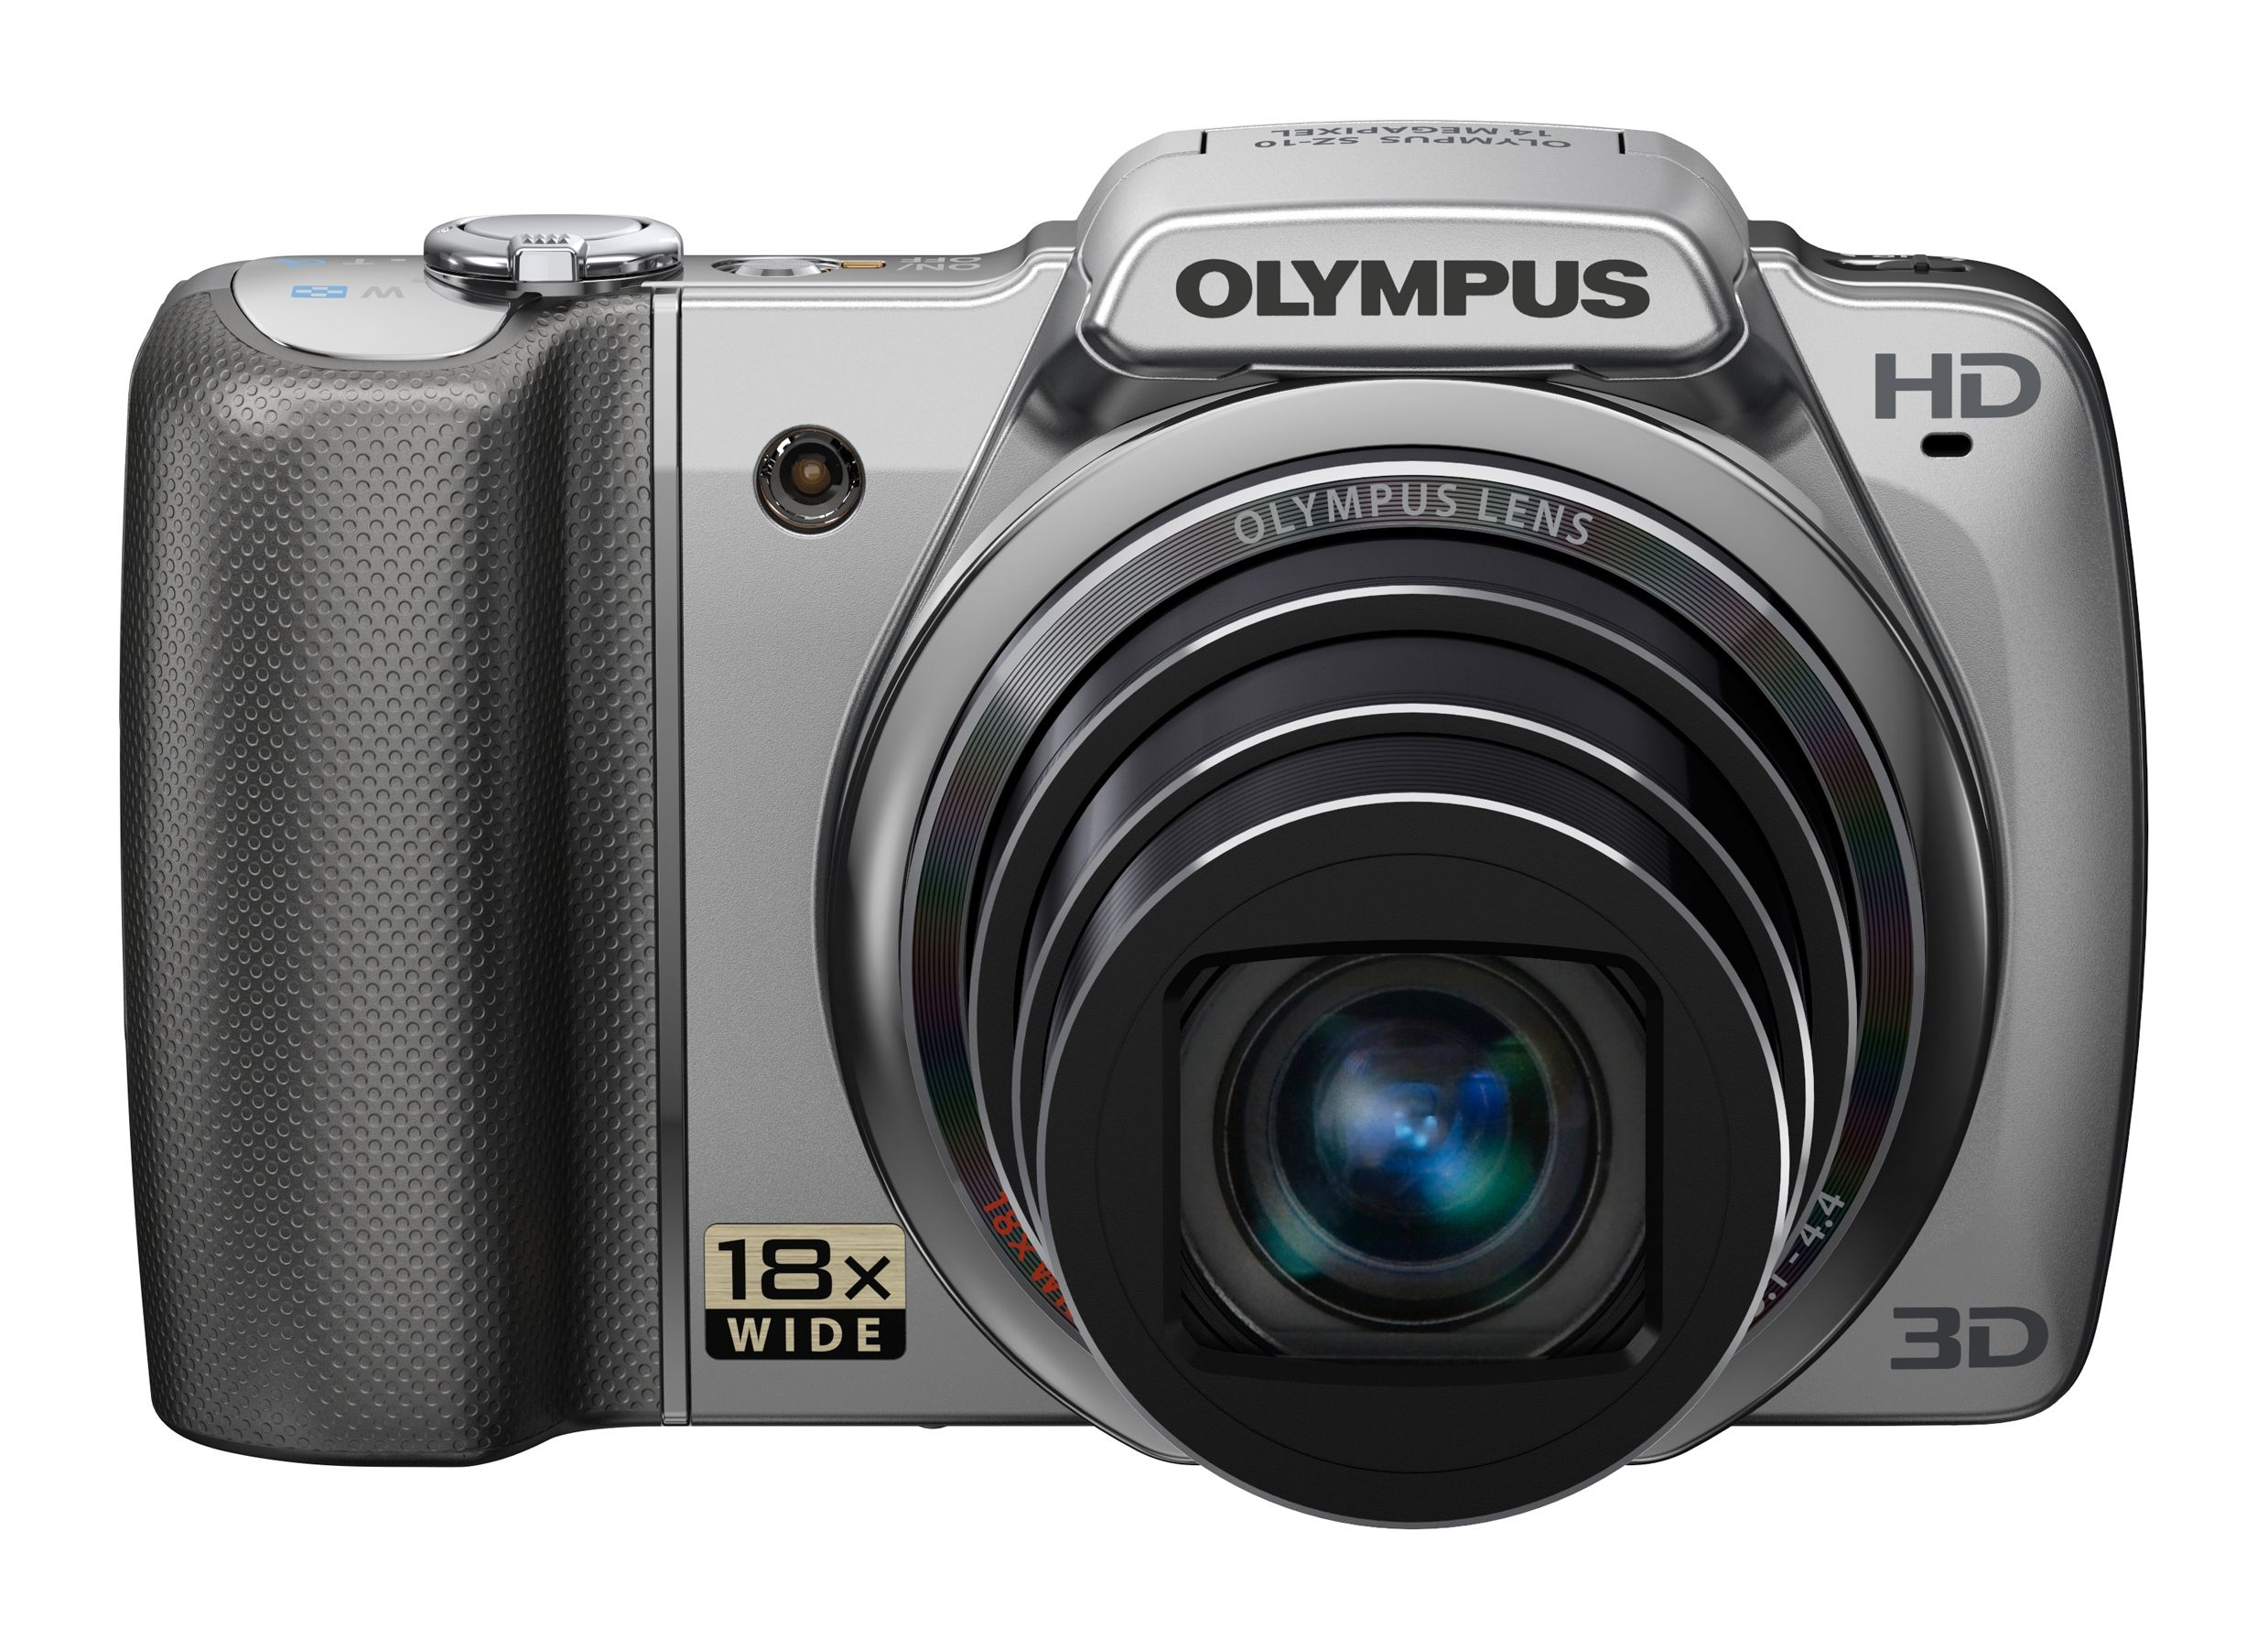 Olympus SZ-10. Mye zoom i et lite kamerahus.